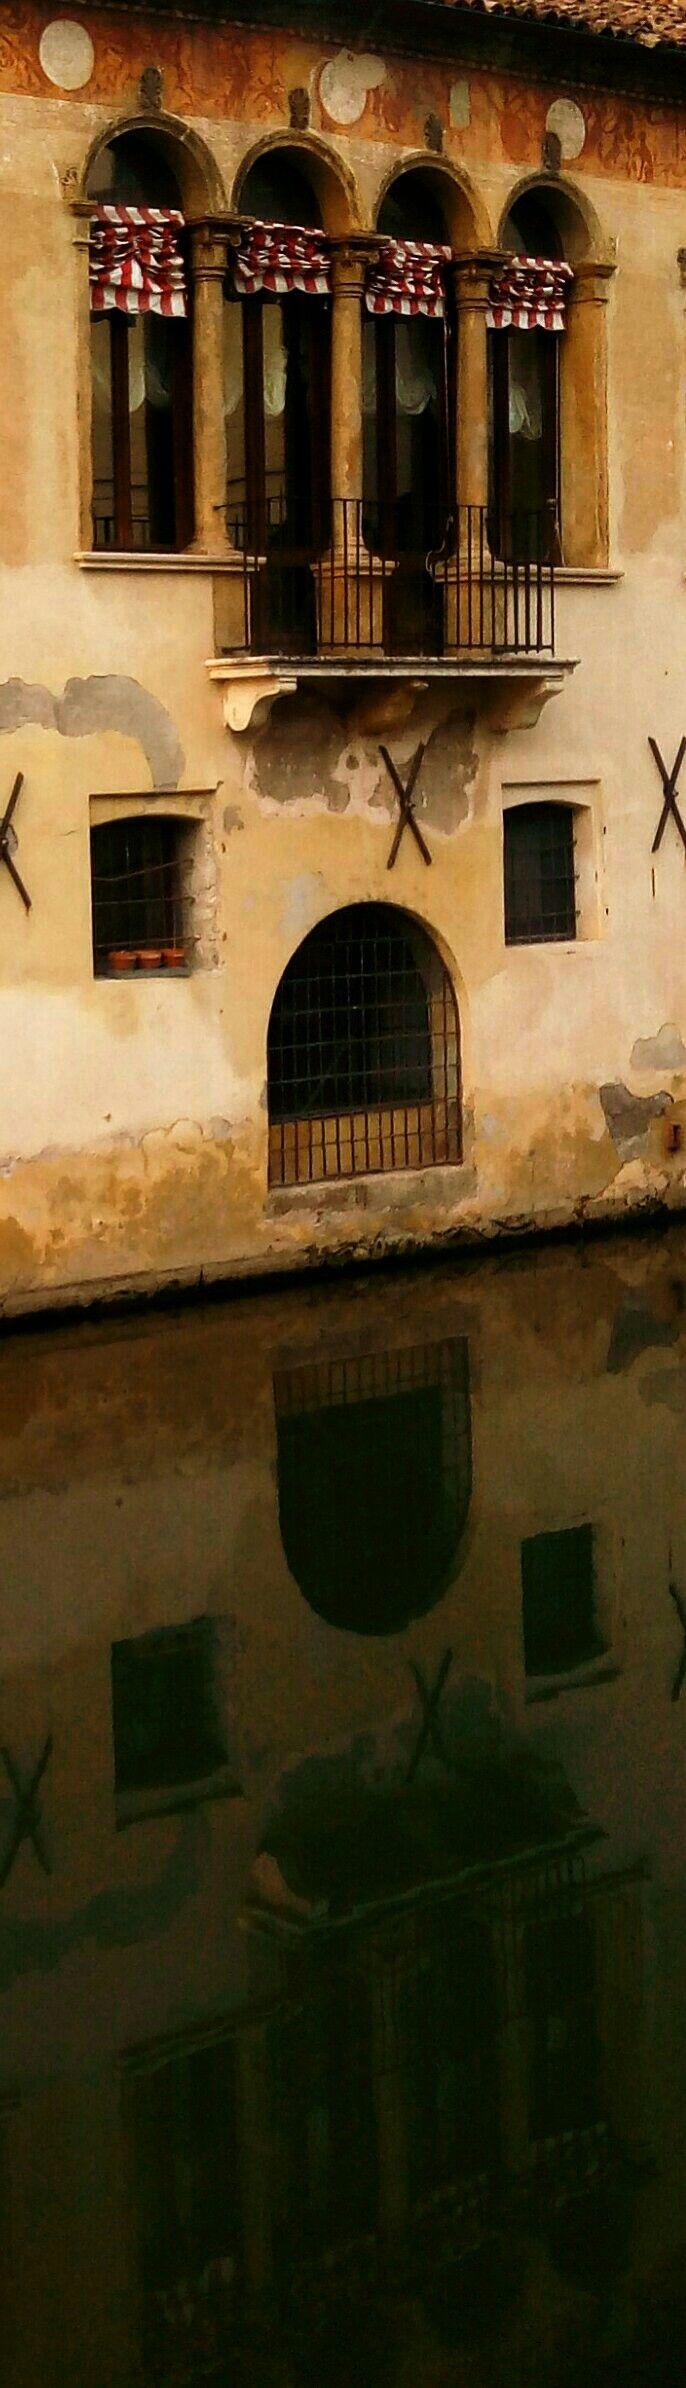 Facciate e finestre d'epoca - my pic Manuela